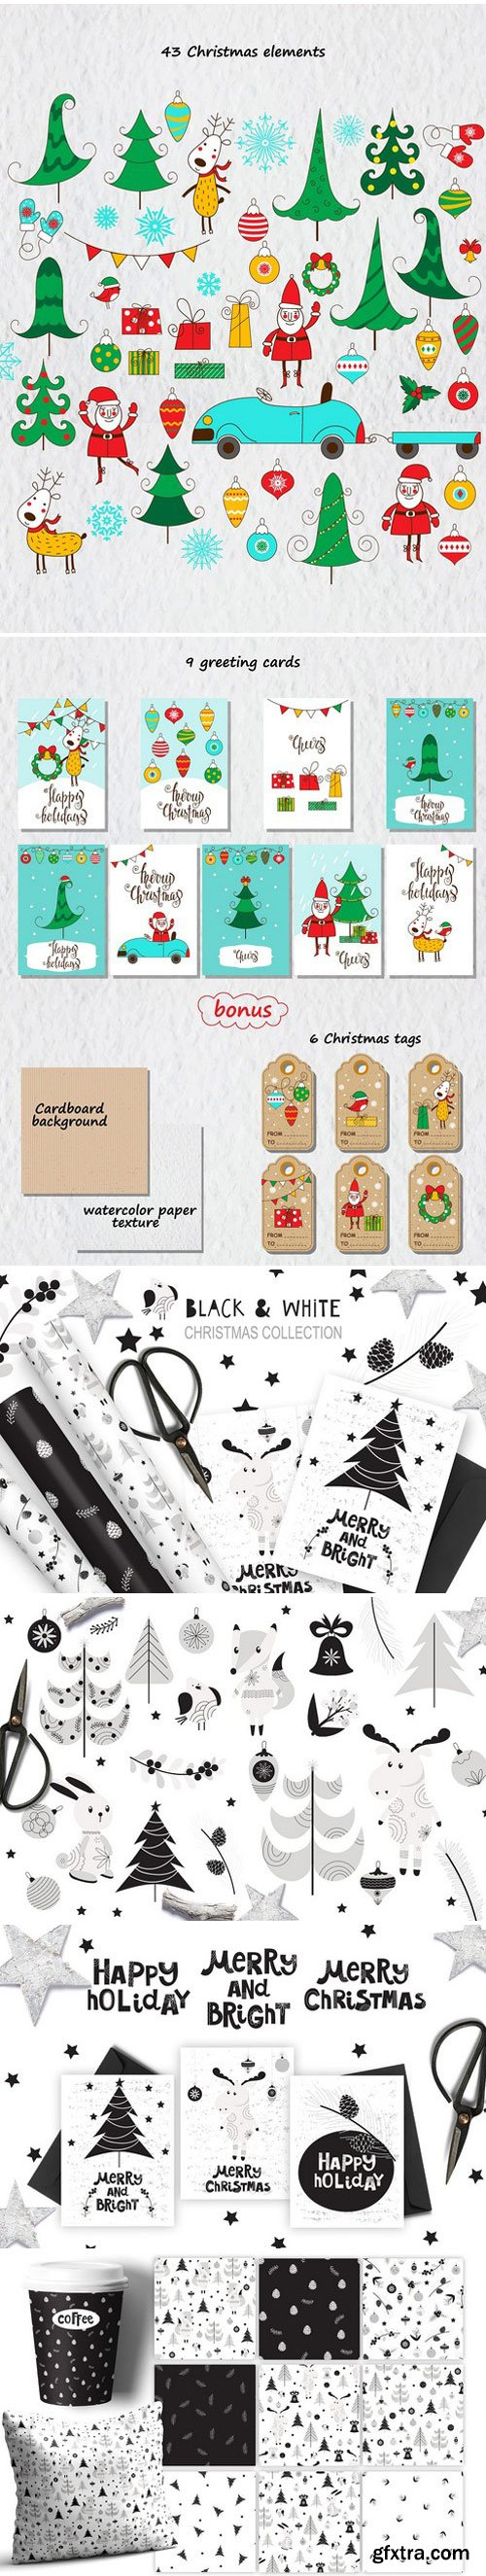 CM - 3 Christmas collection 2153667